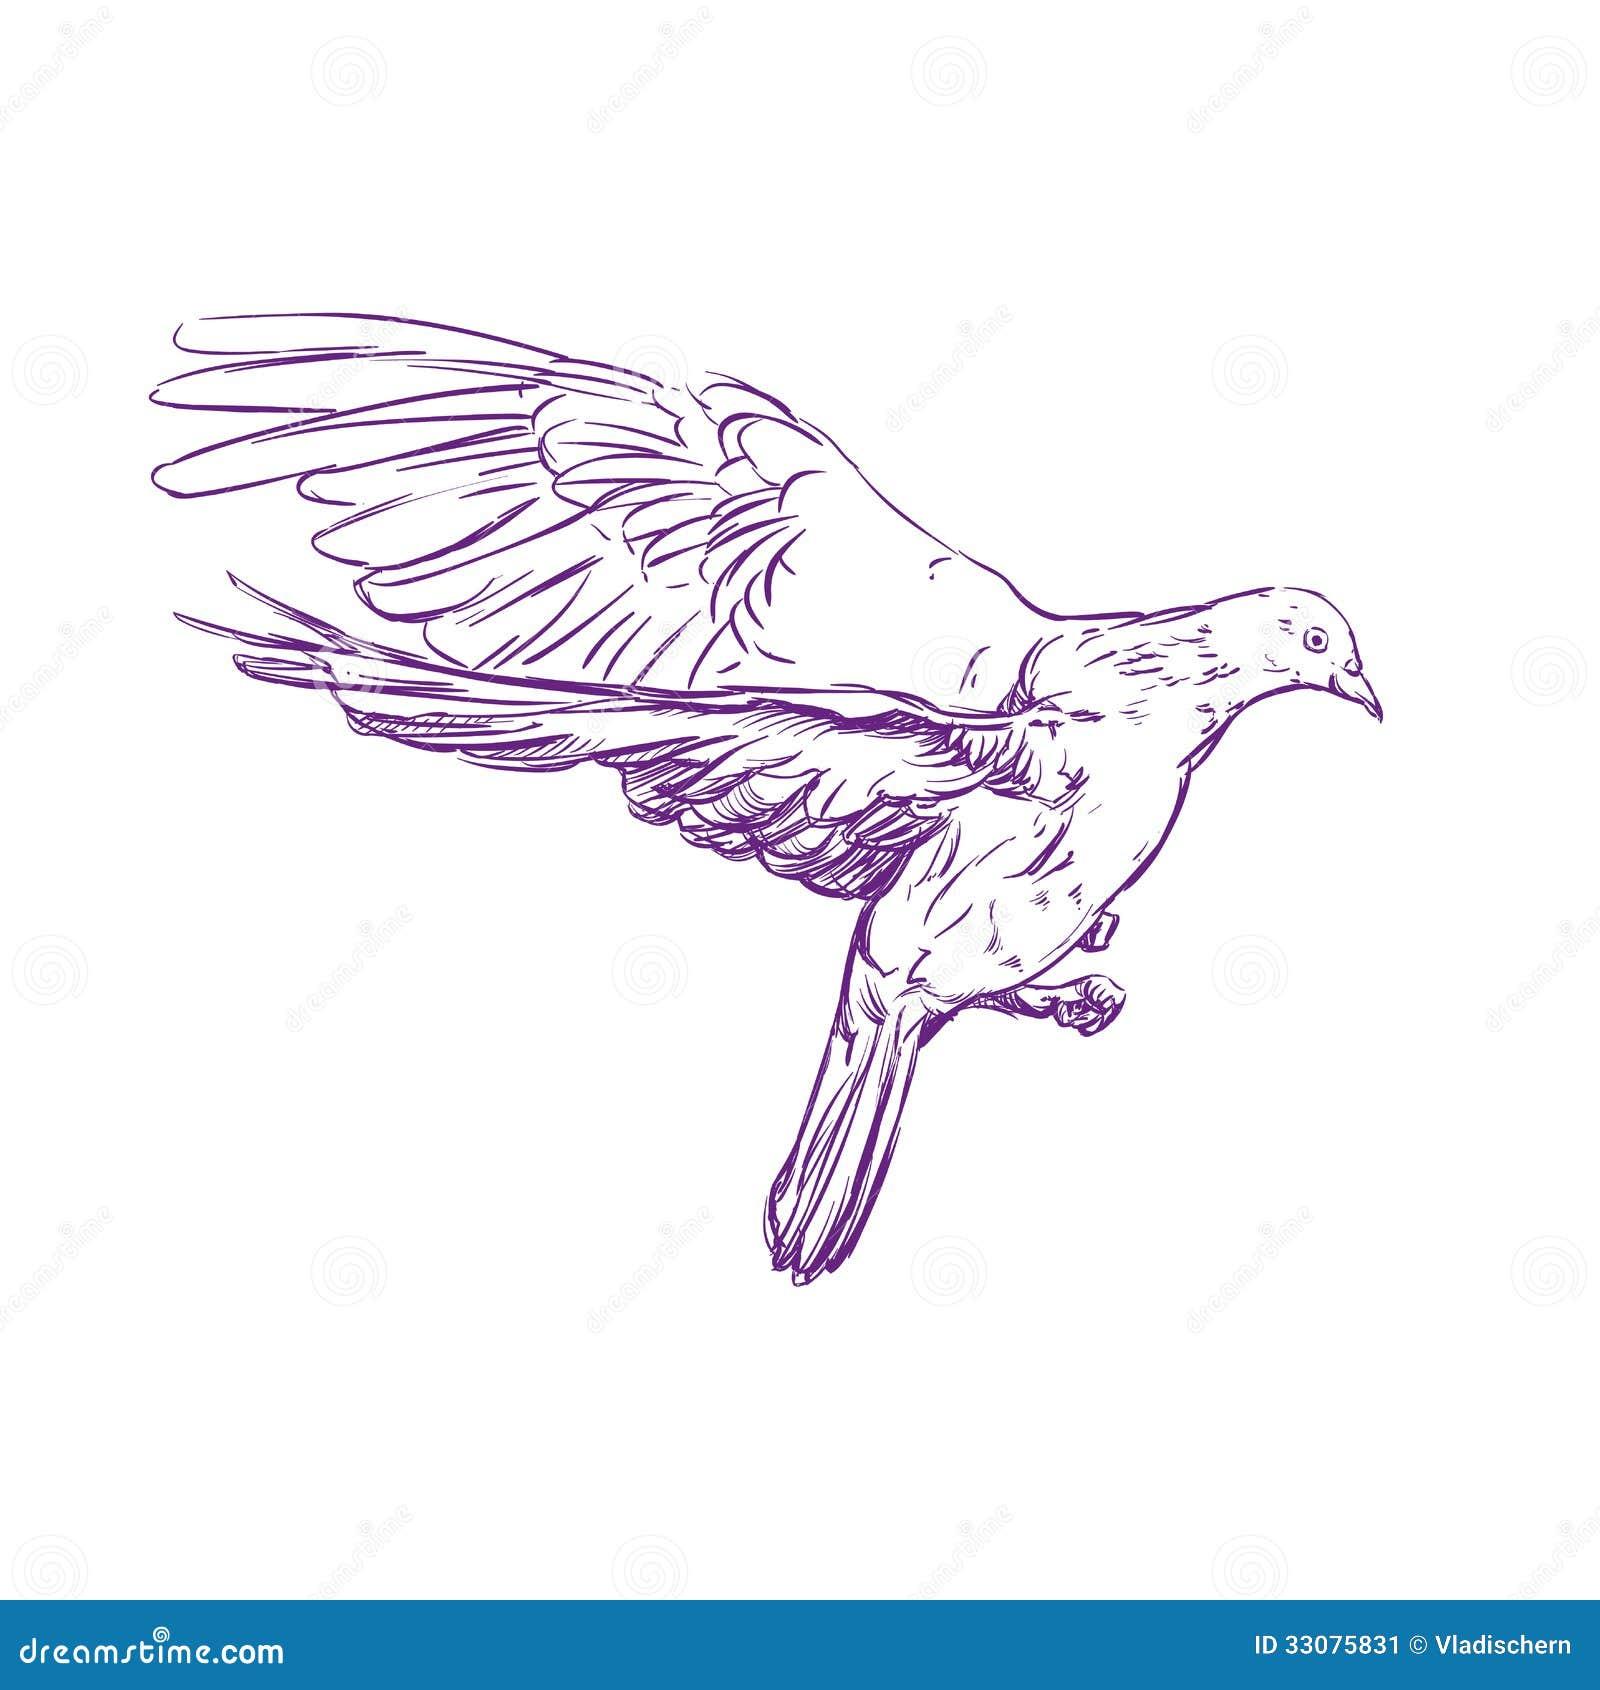 Тату голуби эскизы на руке